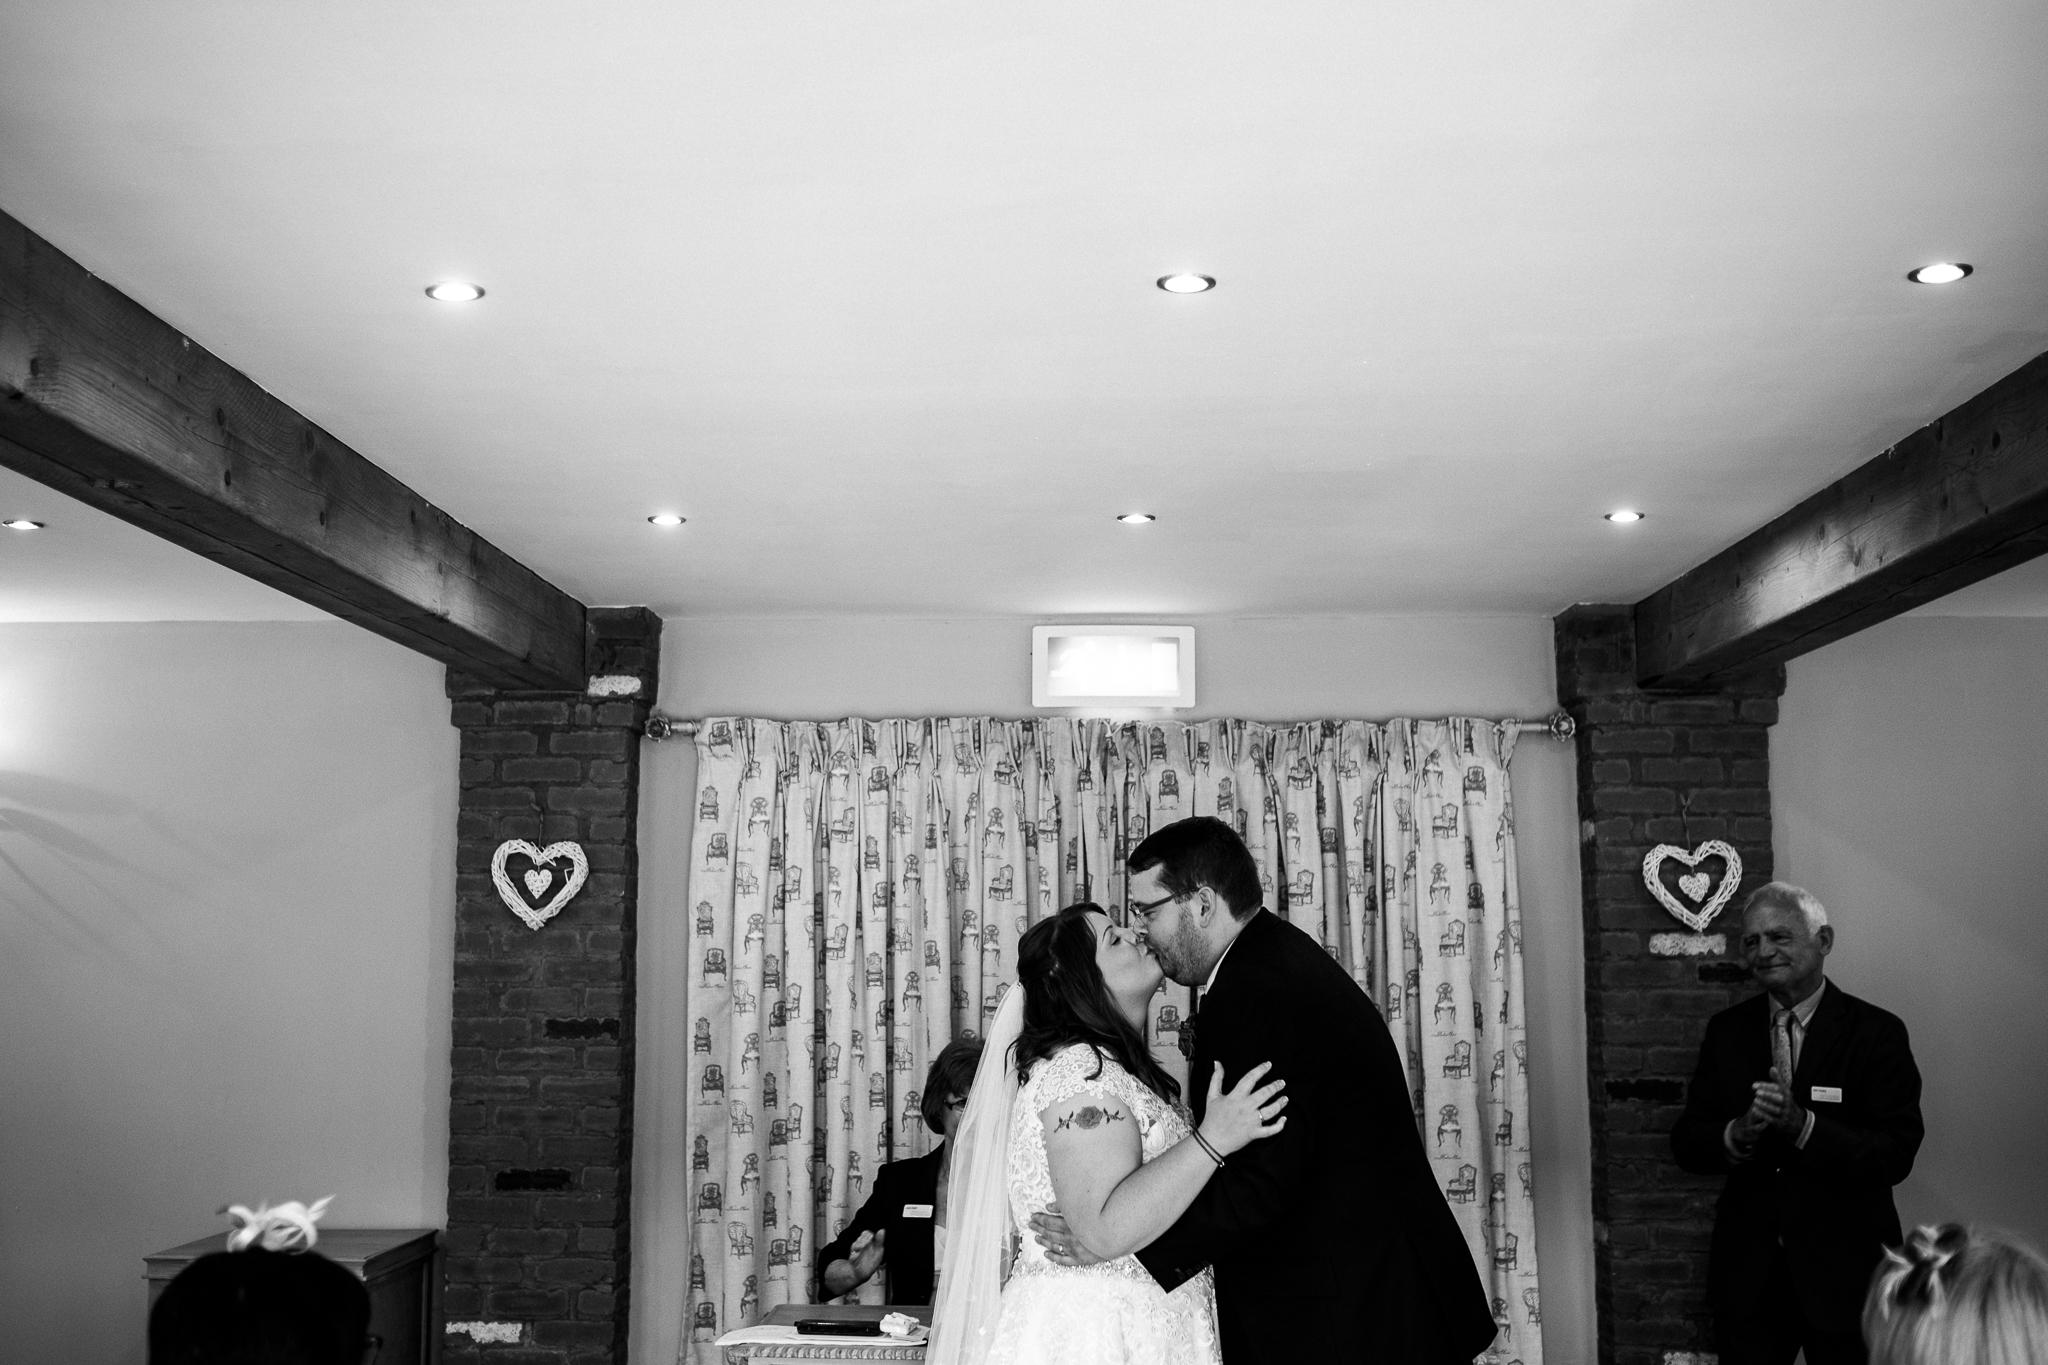 Geek Lego Wedding at Slater's County Inn, Baldwin's Gate, Staffordshire-20.jpg